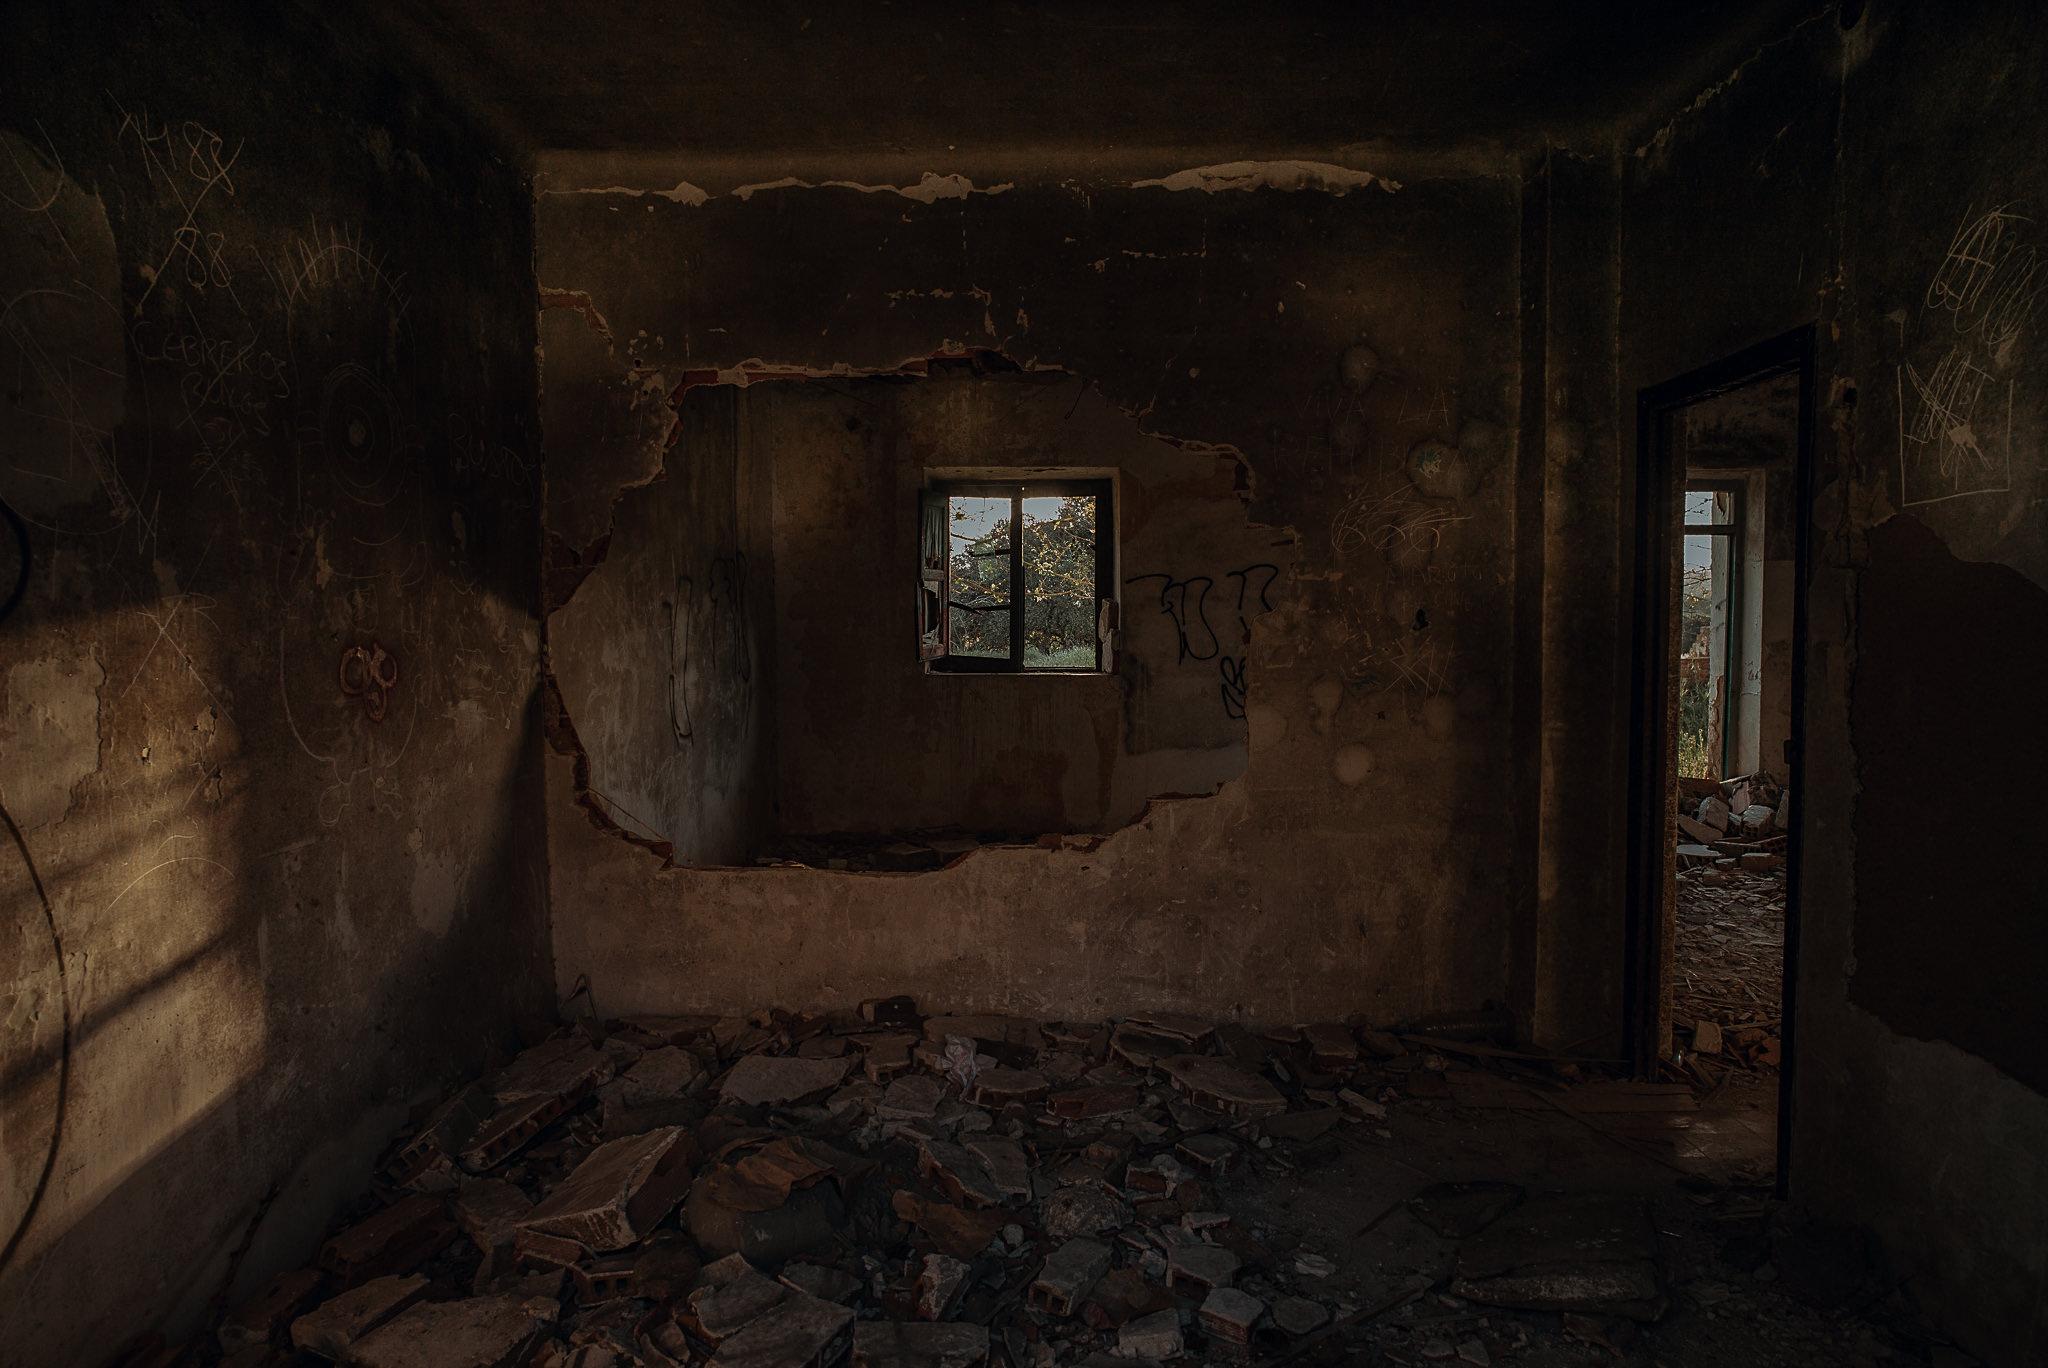 Fotografo-FedeGrau-Visions_in_Ruins-16.jpg